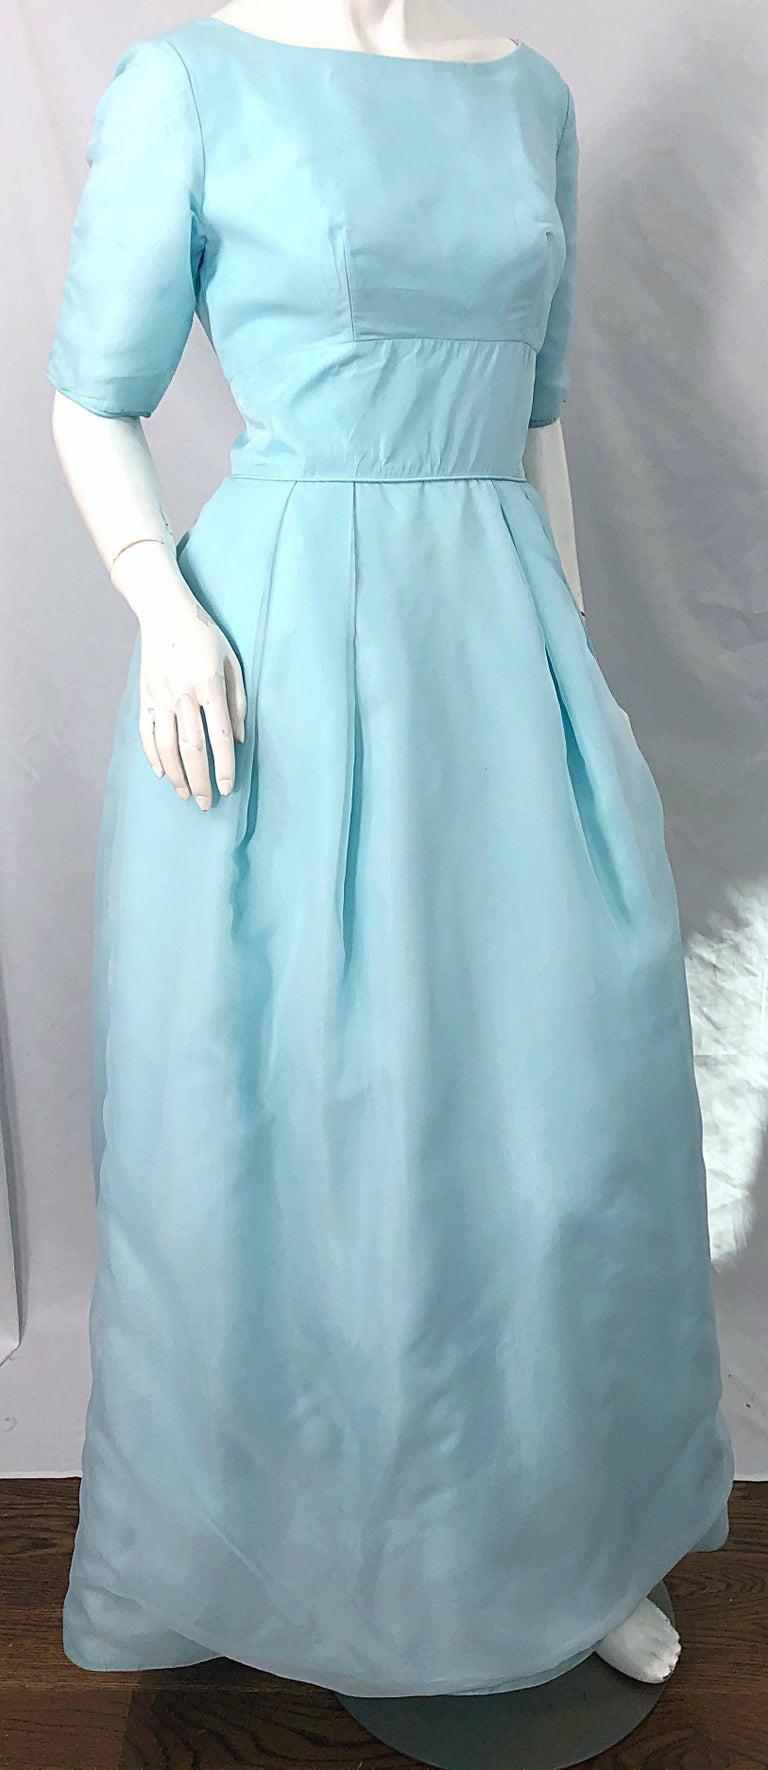 1950s Demi Couture Light Blue Cinderella Silk Chiffon Taffeta 3/4 Sleeves Gown For Sale 6